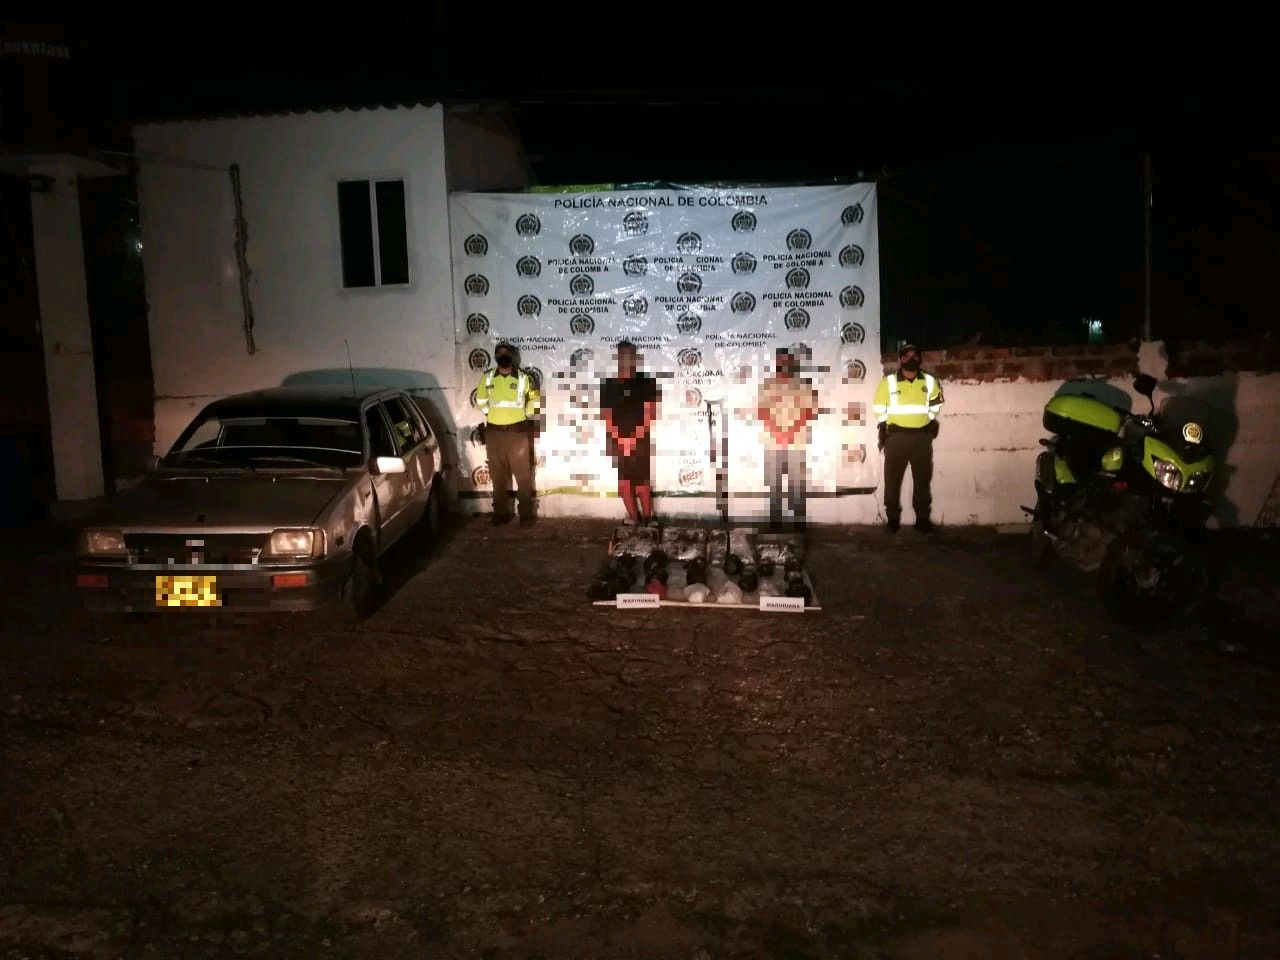 Cayó 'narco-móvil' con 25 kilos en marihuana cerca a Saldaña